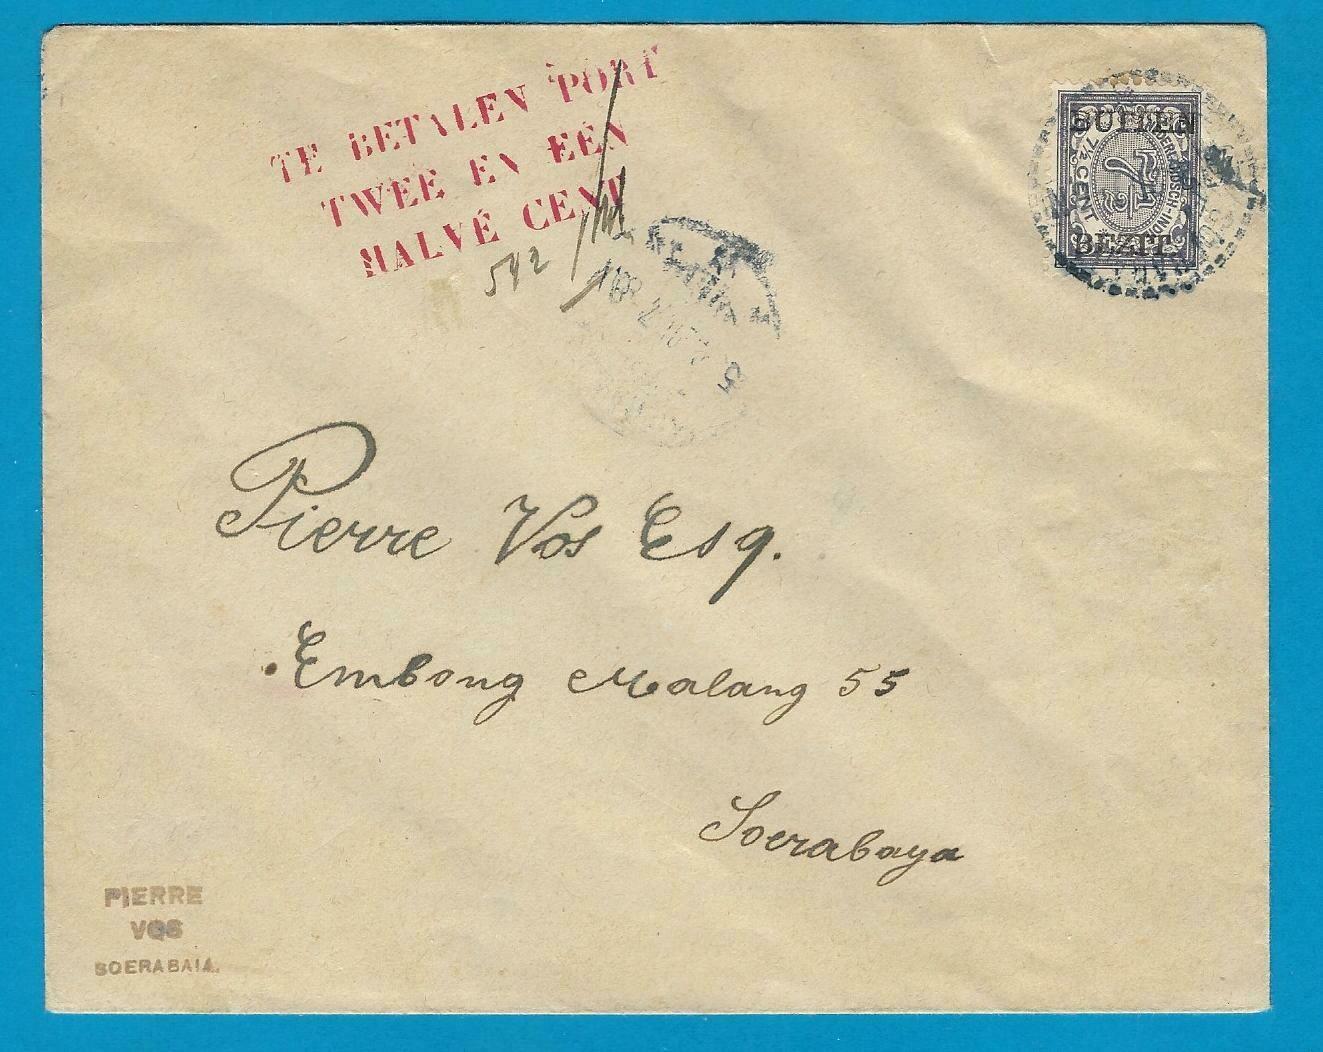 NETHERLANDS EAST INDIES postage due cover 1921 Soerabaja